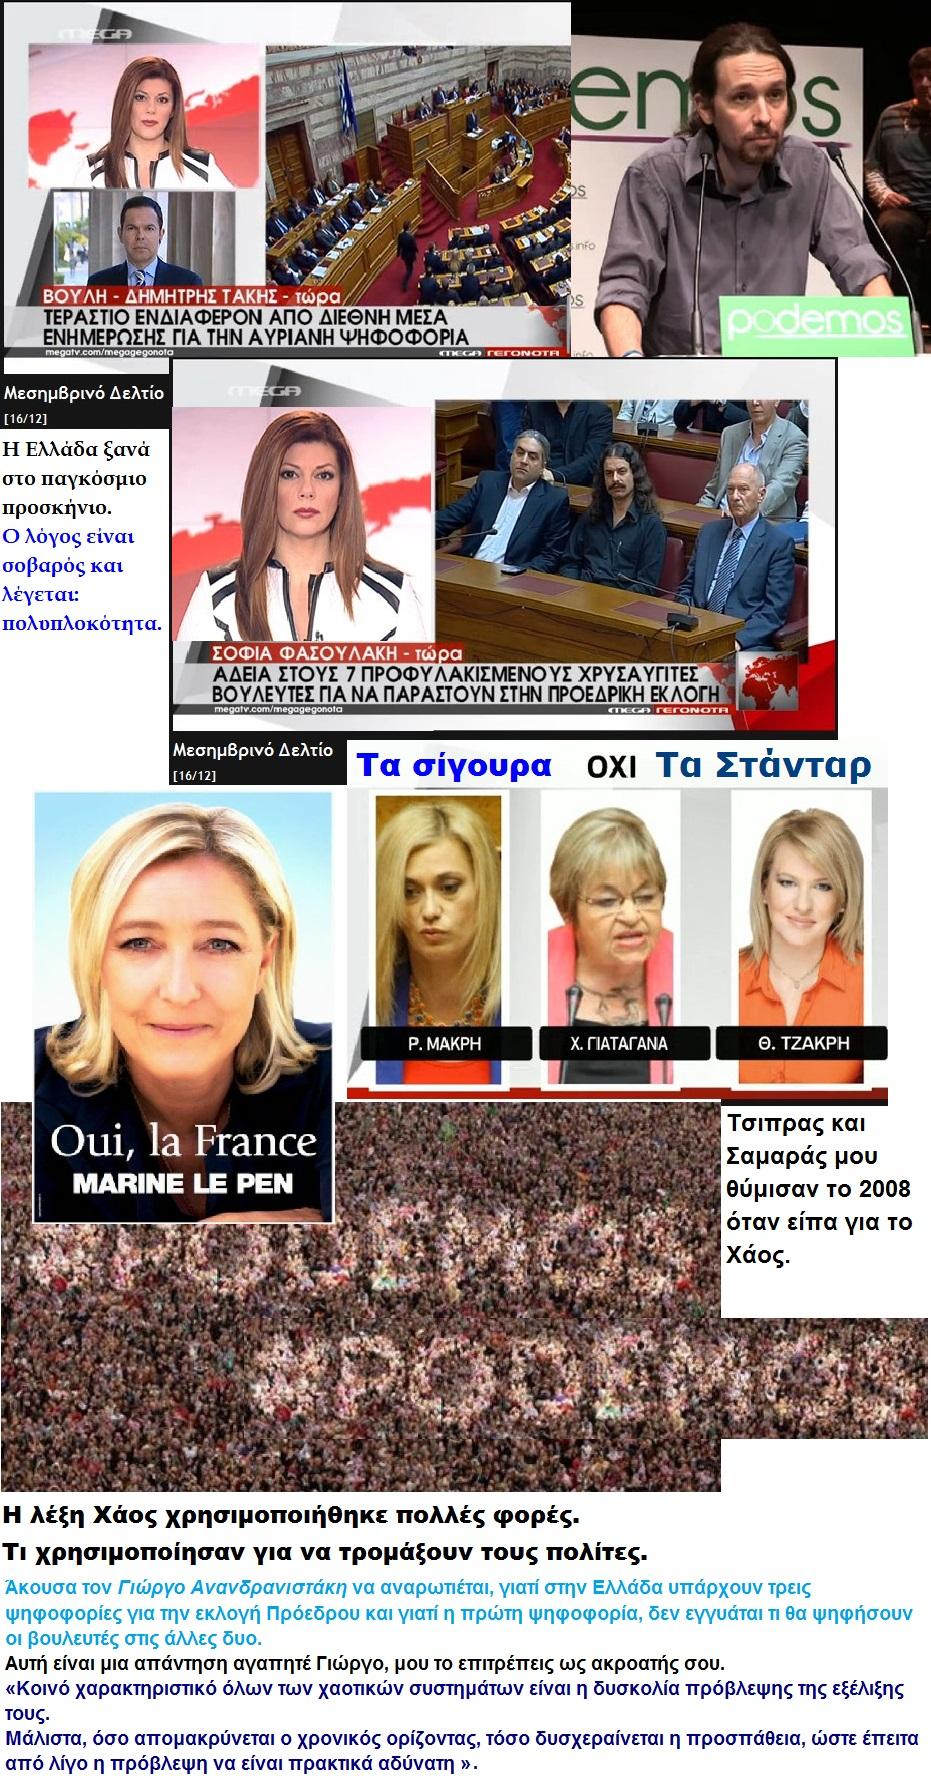 ELLADA INTERNATIONAL MEDIA PROEDROS DHMOKRATIAS 01 171214